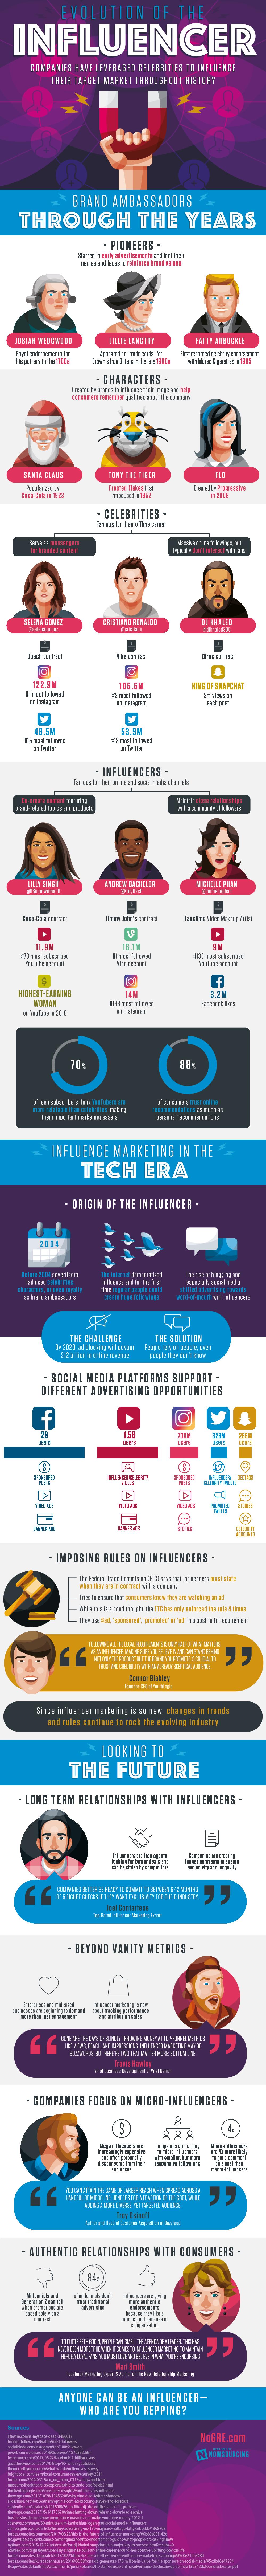 evolution-of-influencers.png